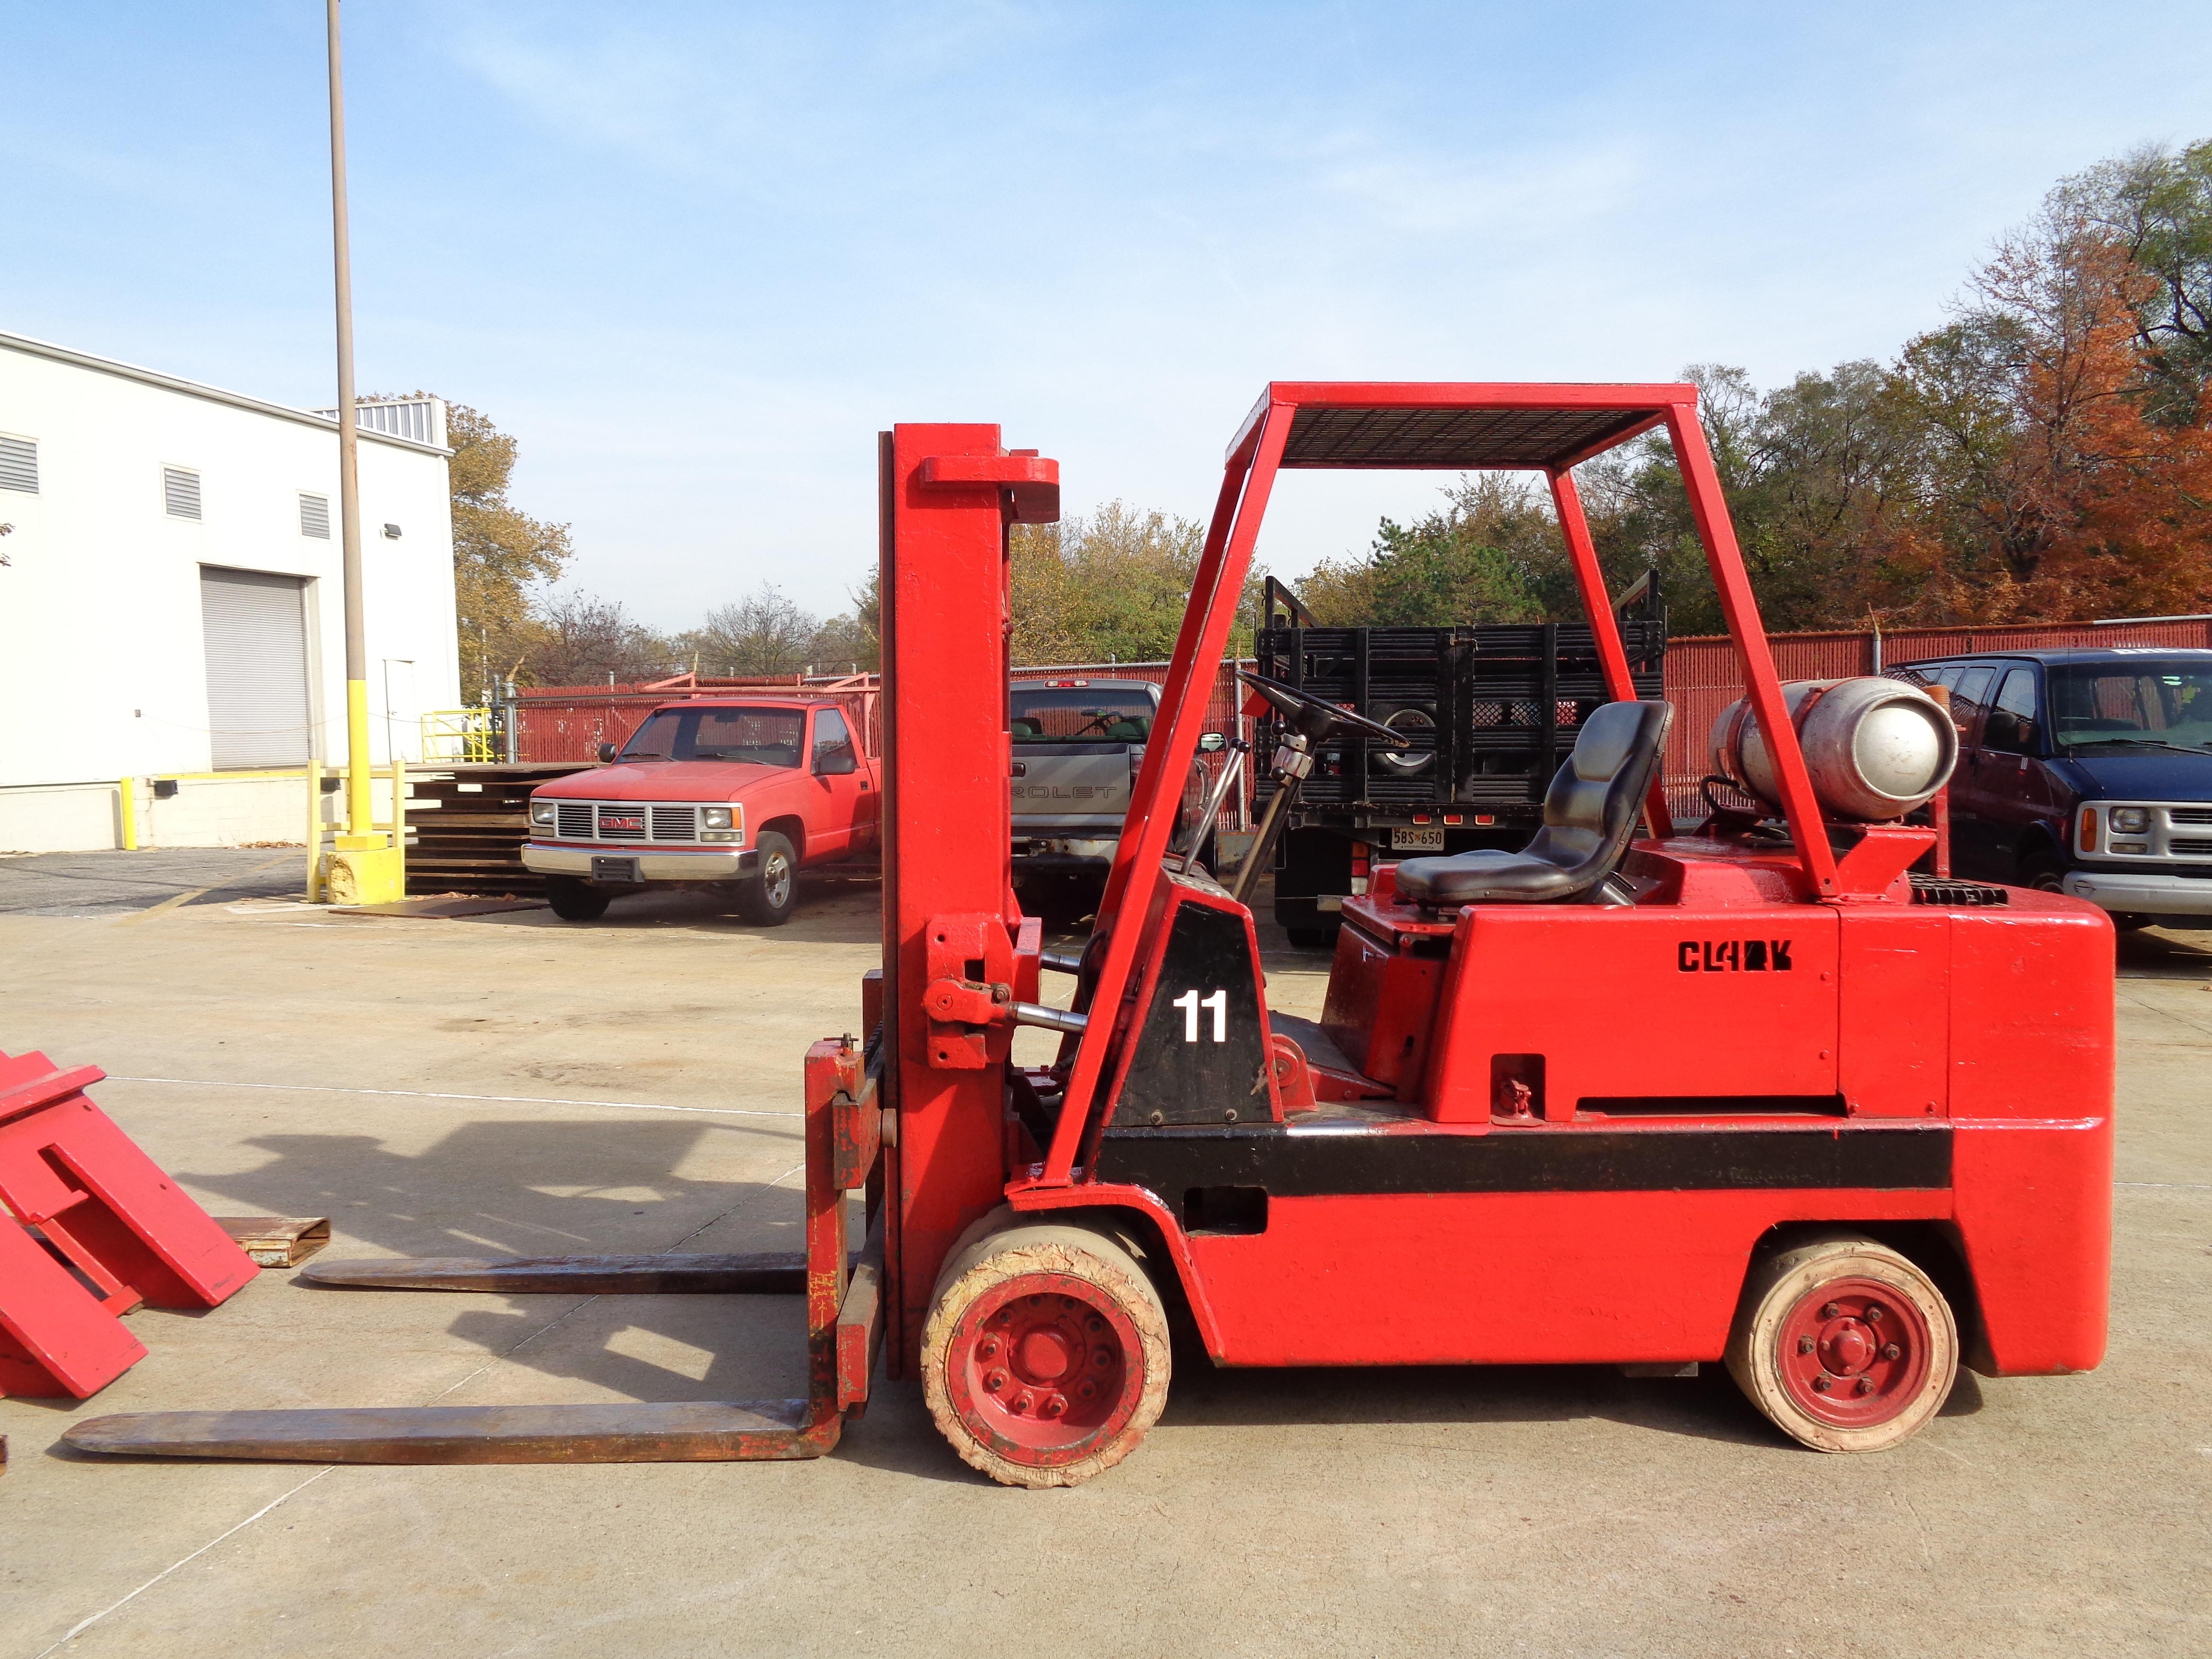 Clark C500-120 Forklift plus boom - 12,000 lbs